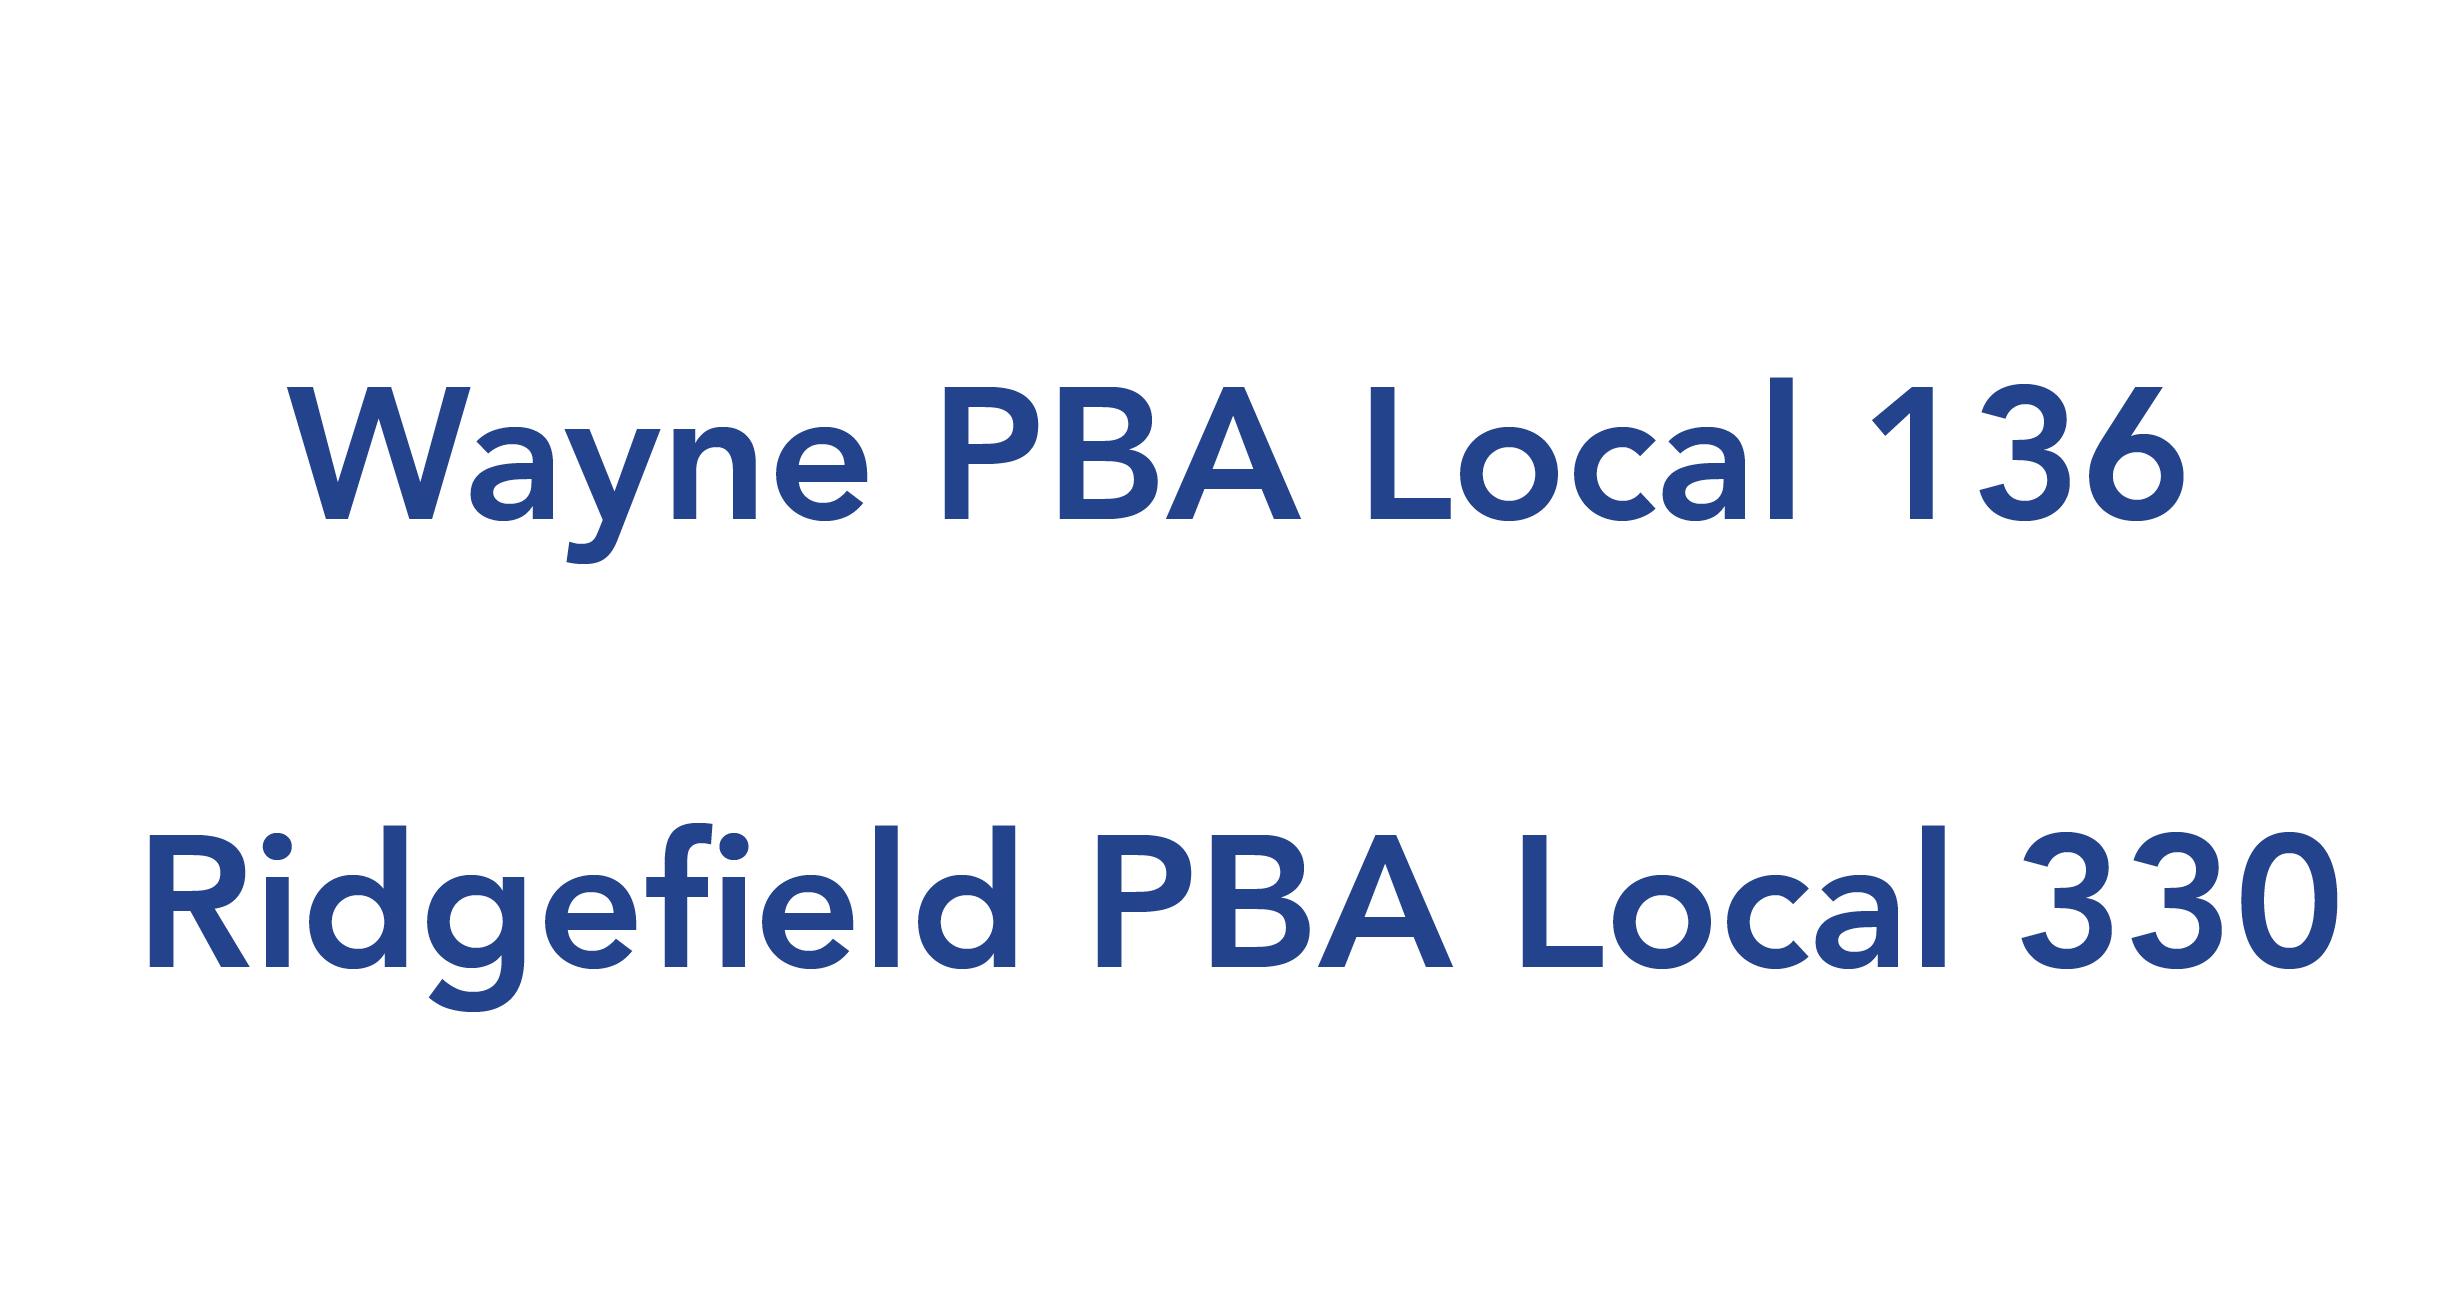 PBA logos.png